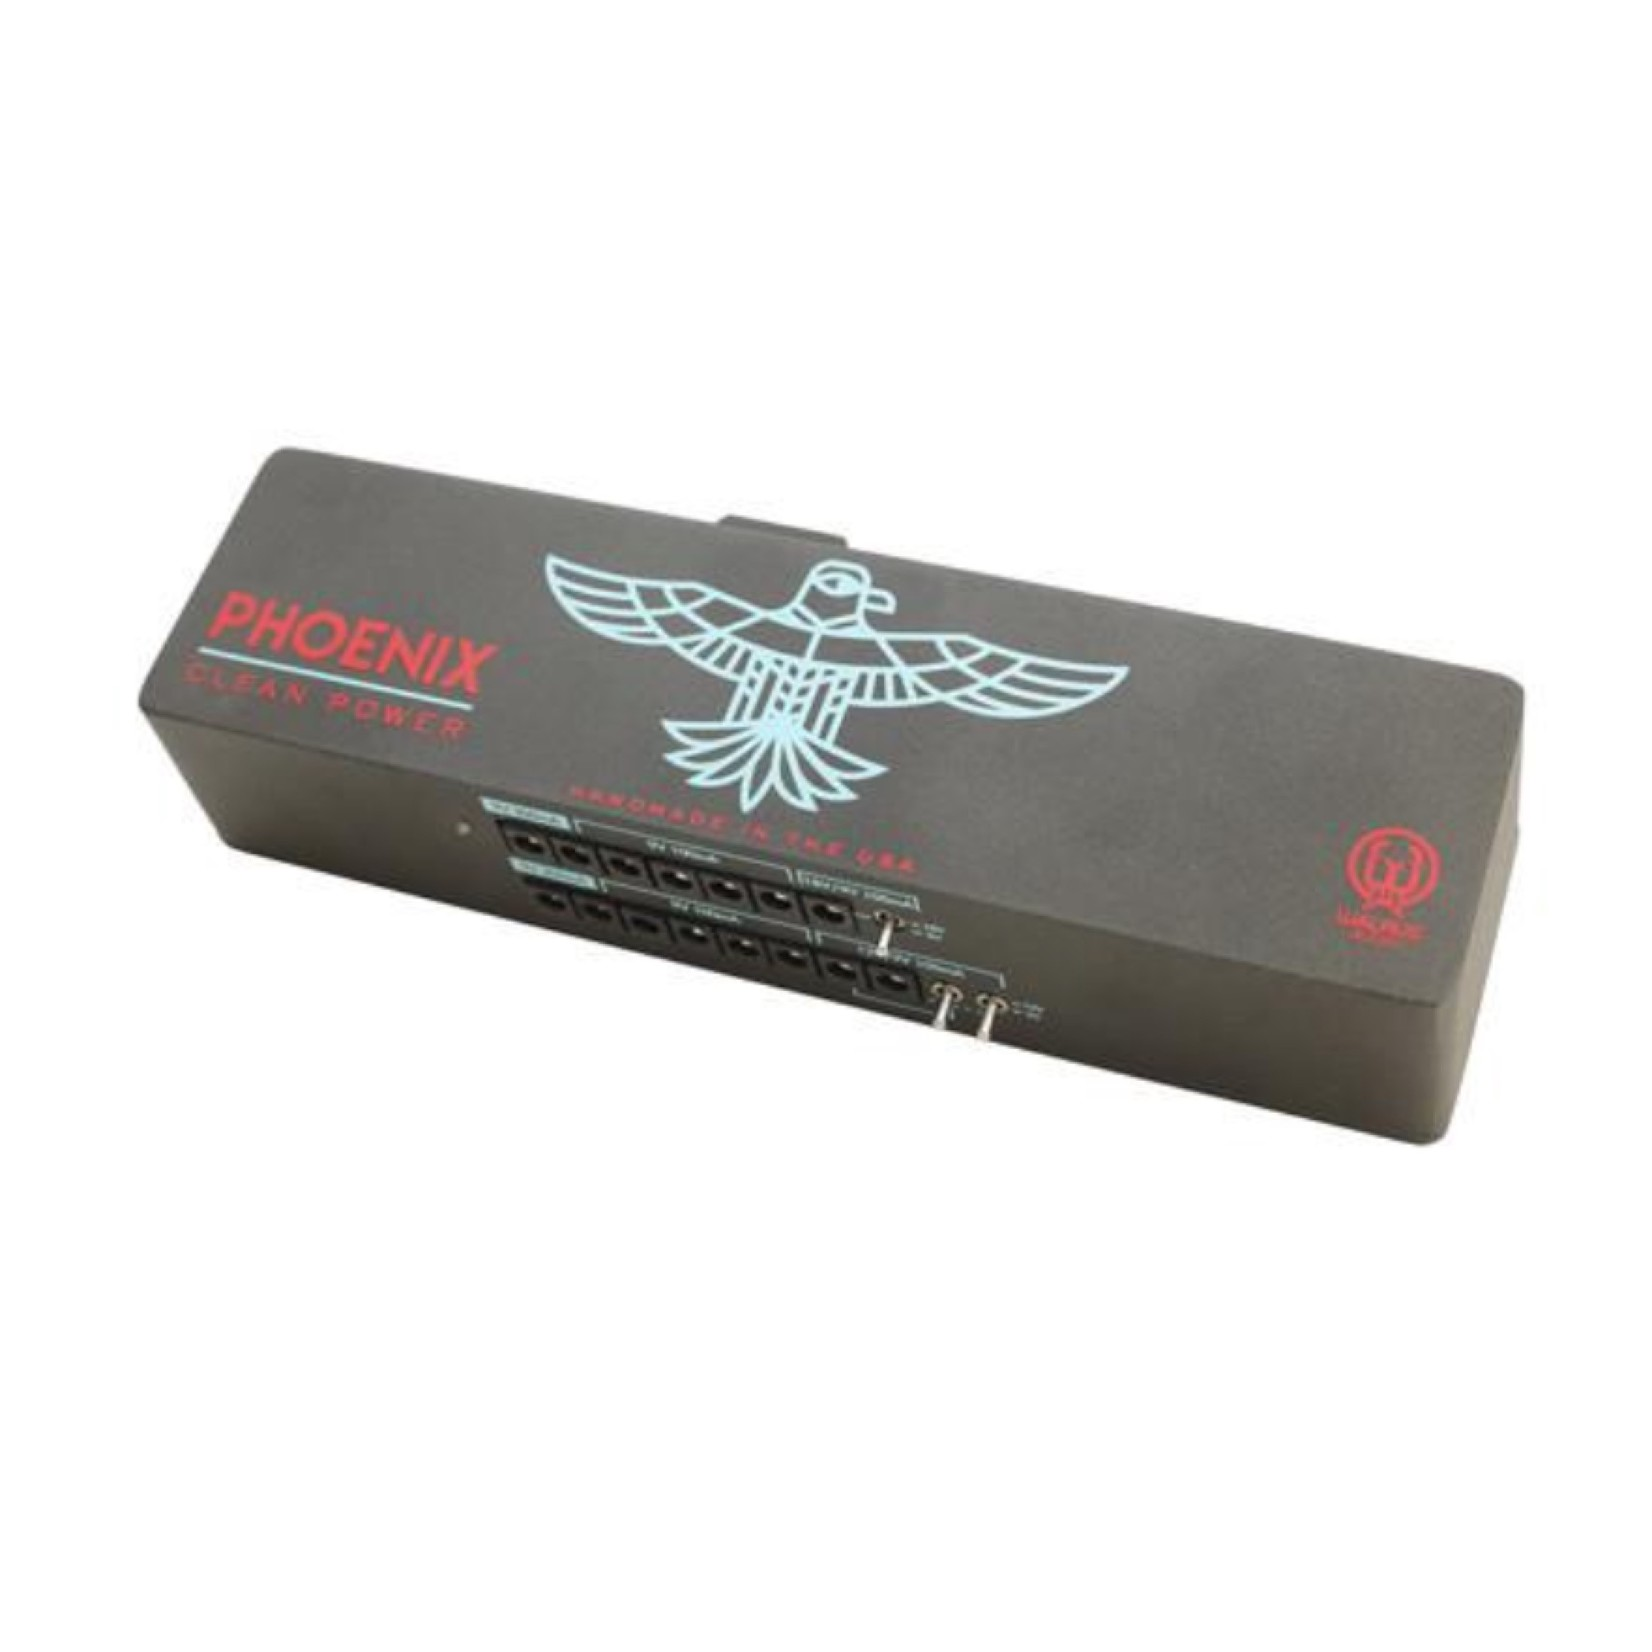 Walrus Audio Walrus Audio Phoenix 15-Output Power Supply (120V -- U.S. Only), v2